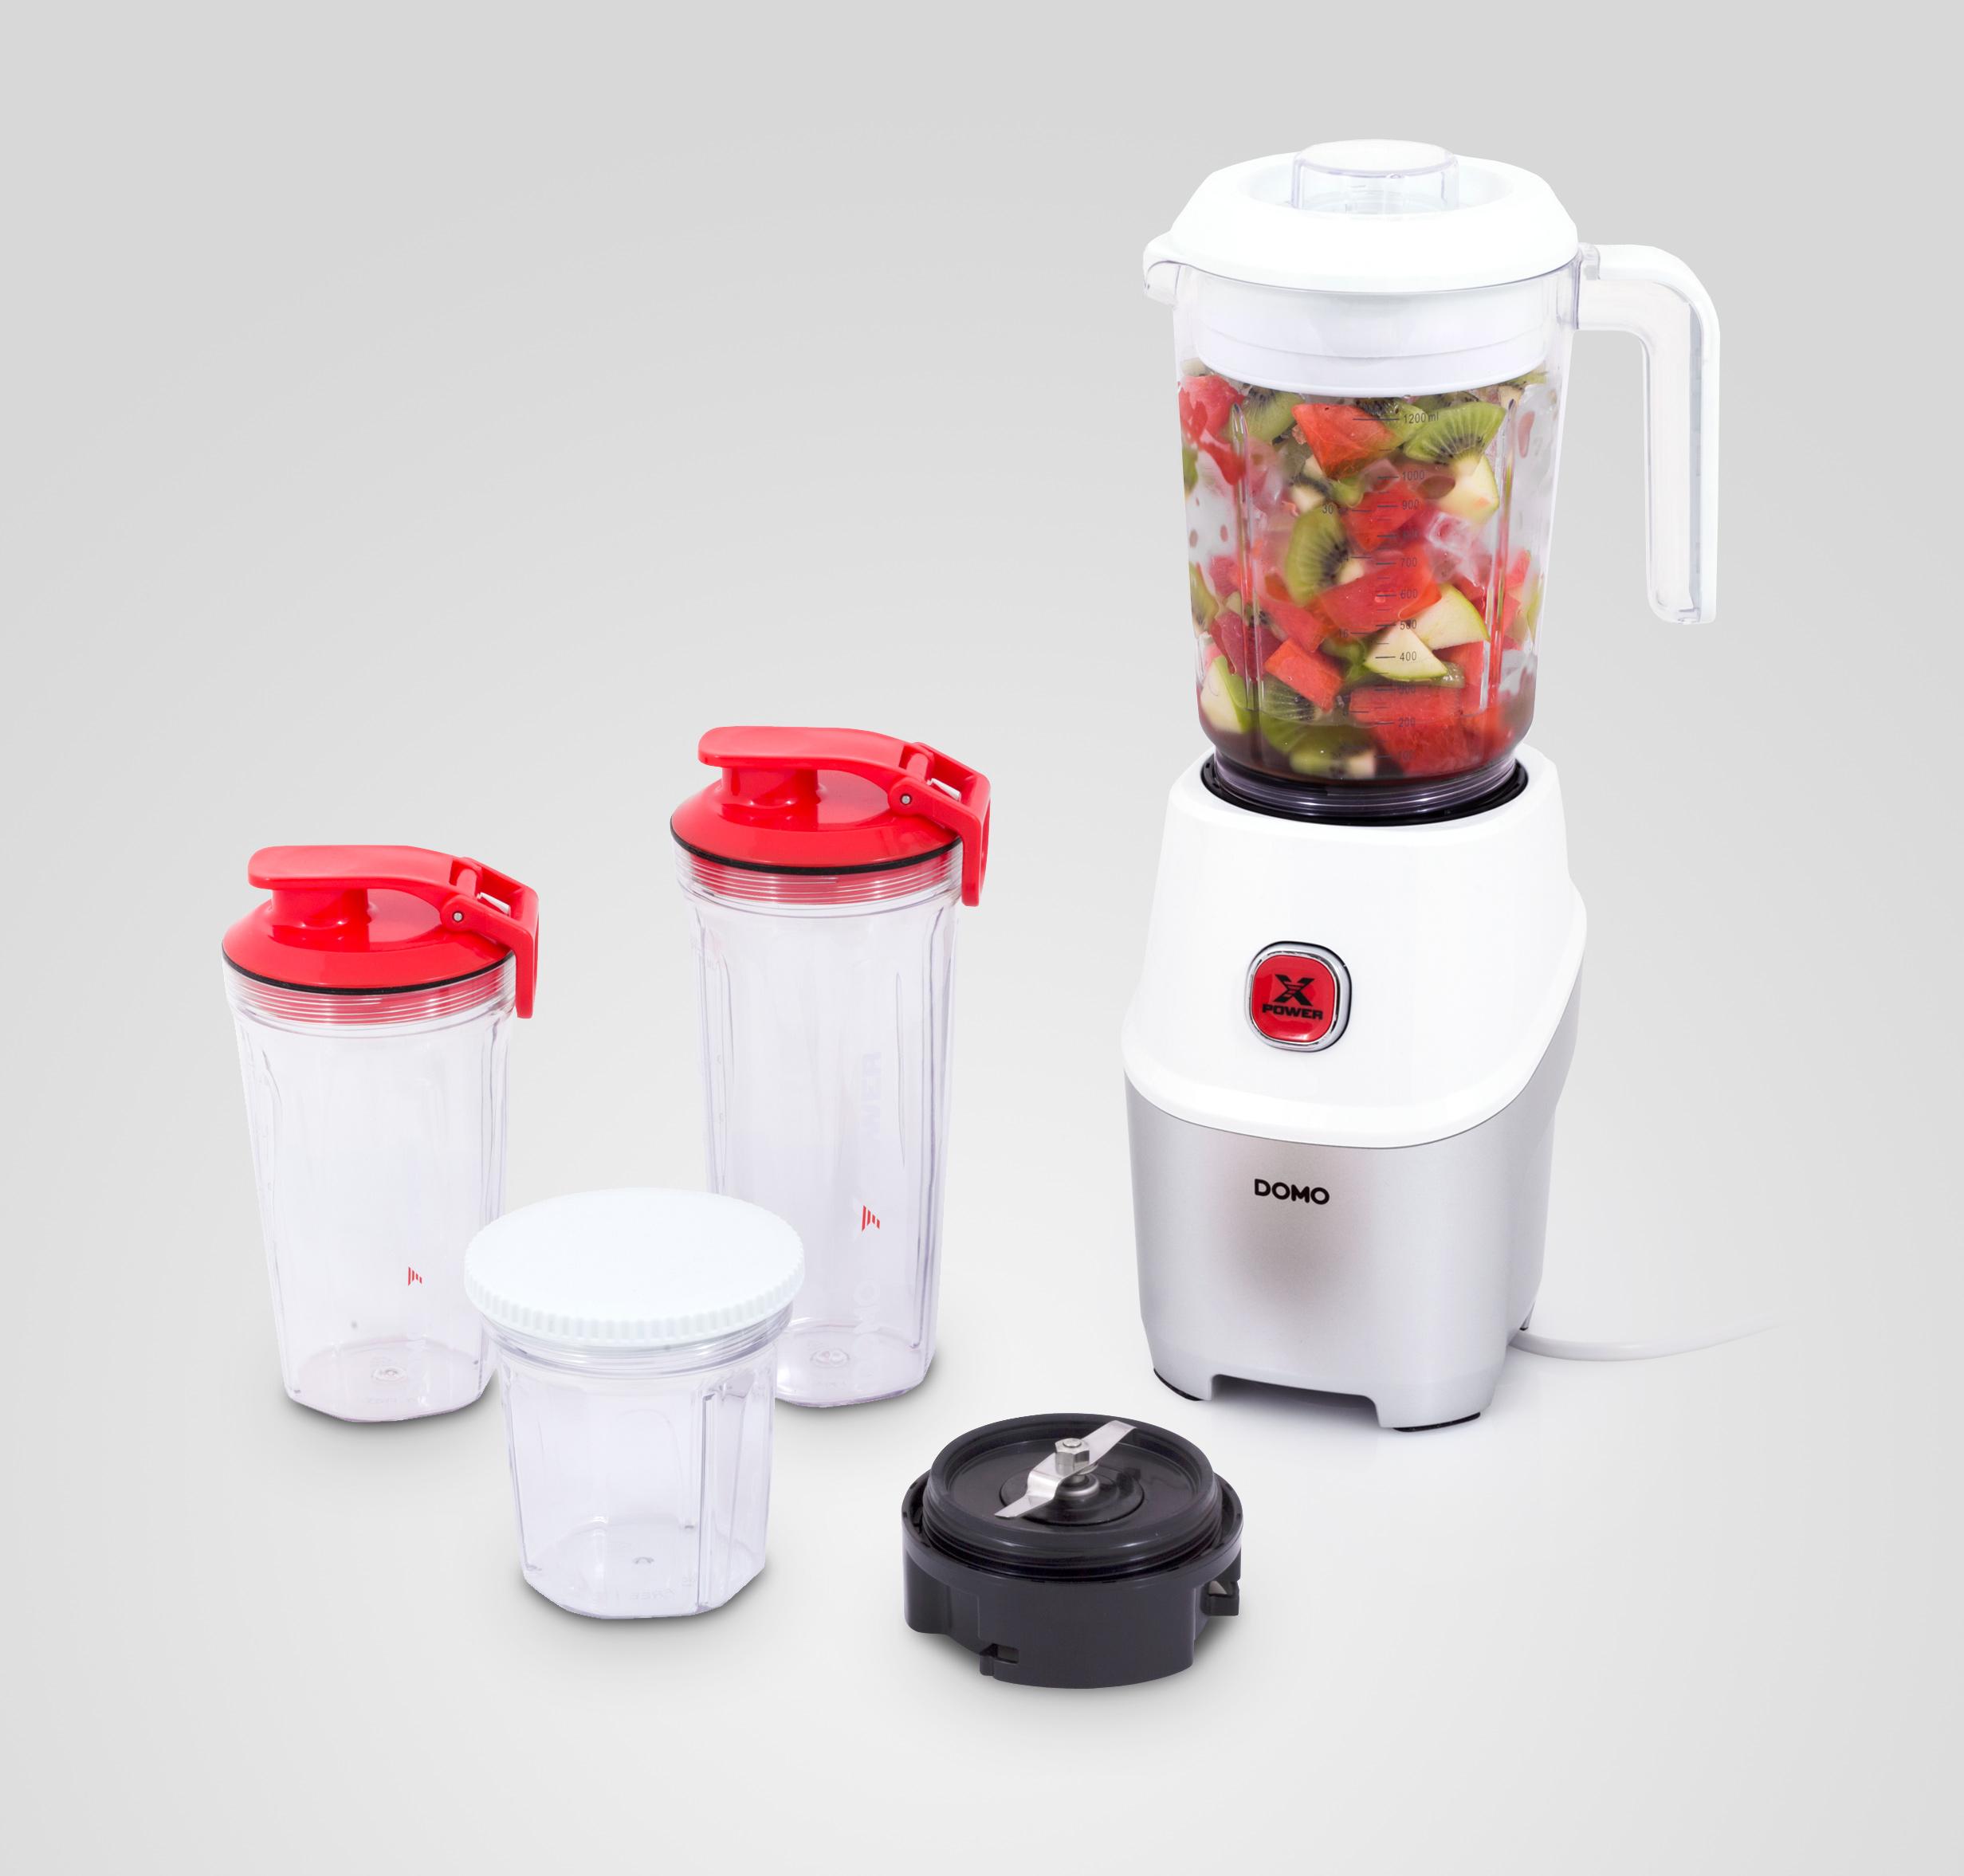 Nutri mixér Xpower s kávomlýnkem - DO9185BL  5b56d71129b